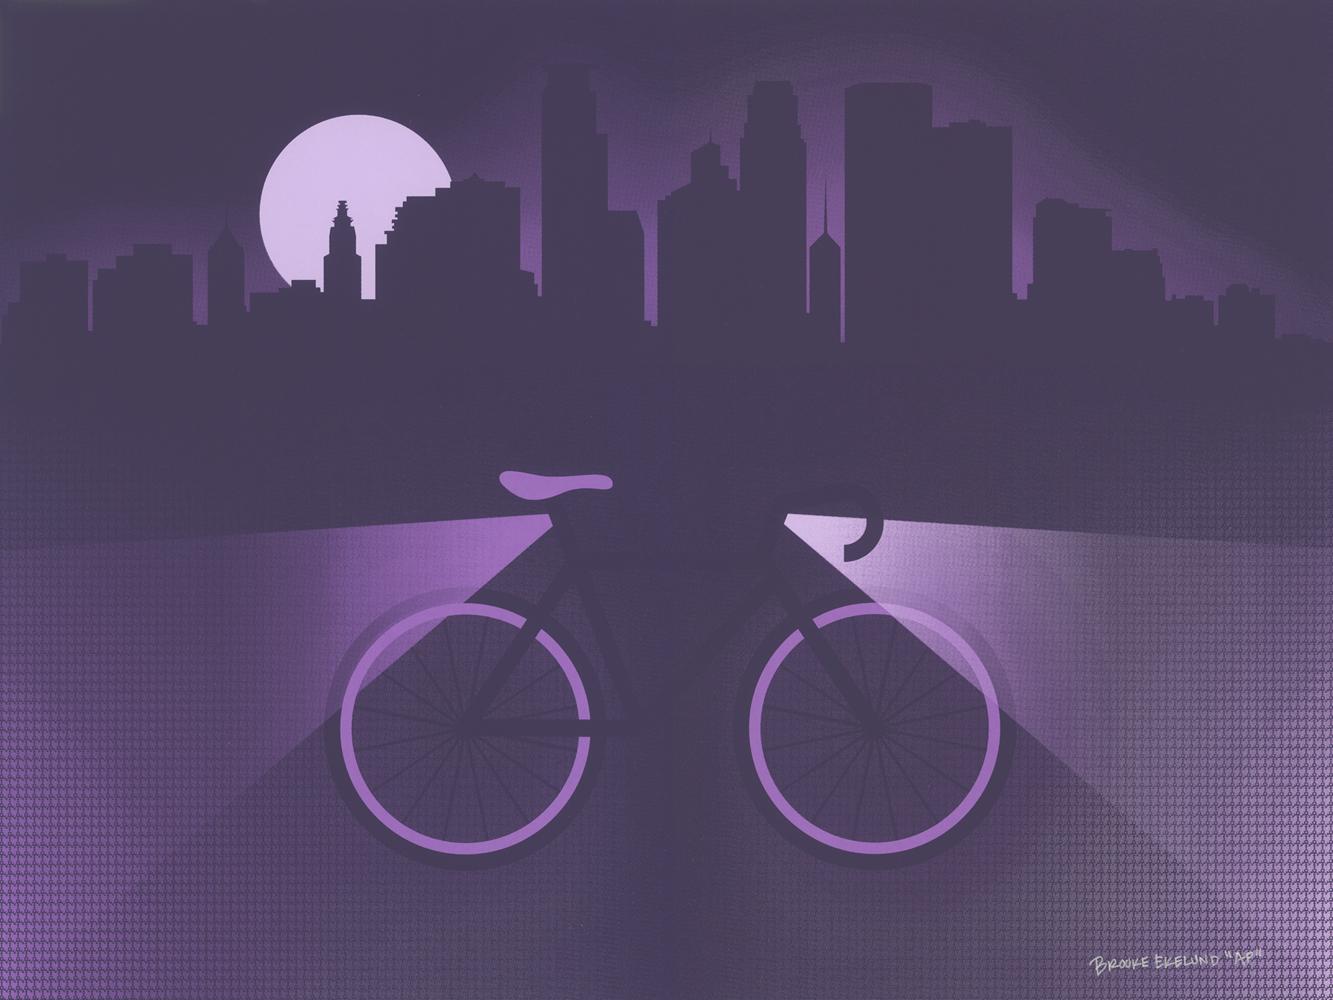 2nite we ride